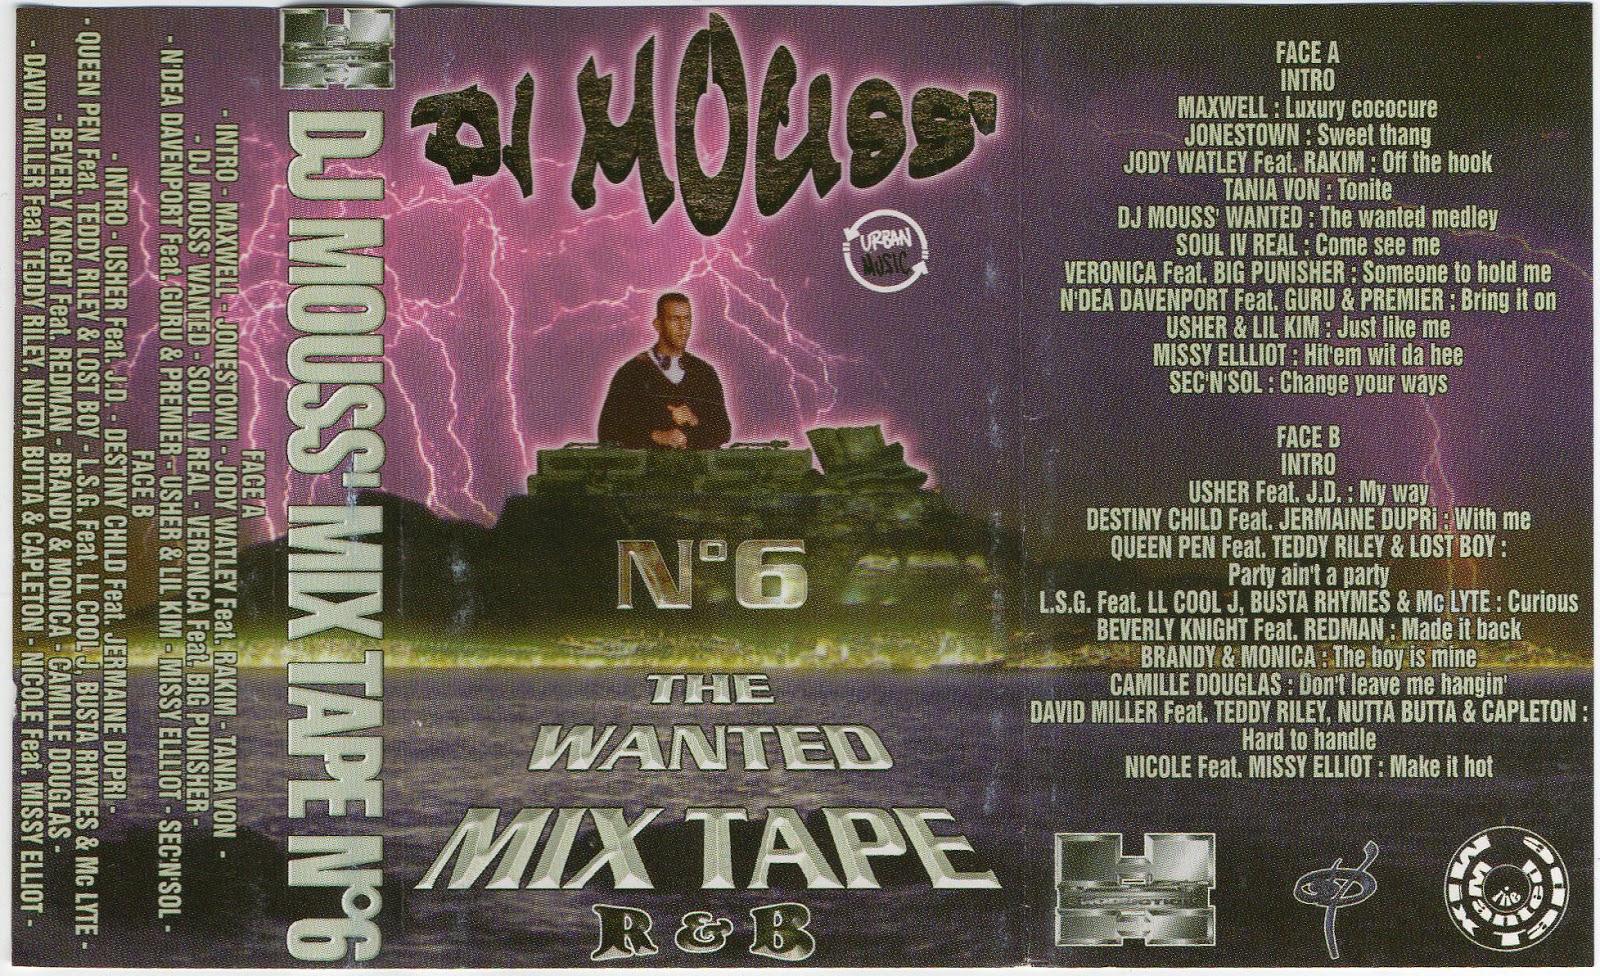 Dj mouss wanted mixtape n°11 (2001) youtube.